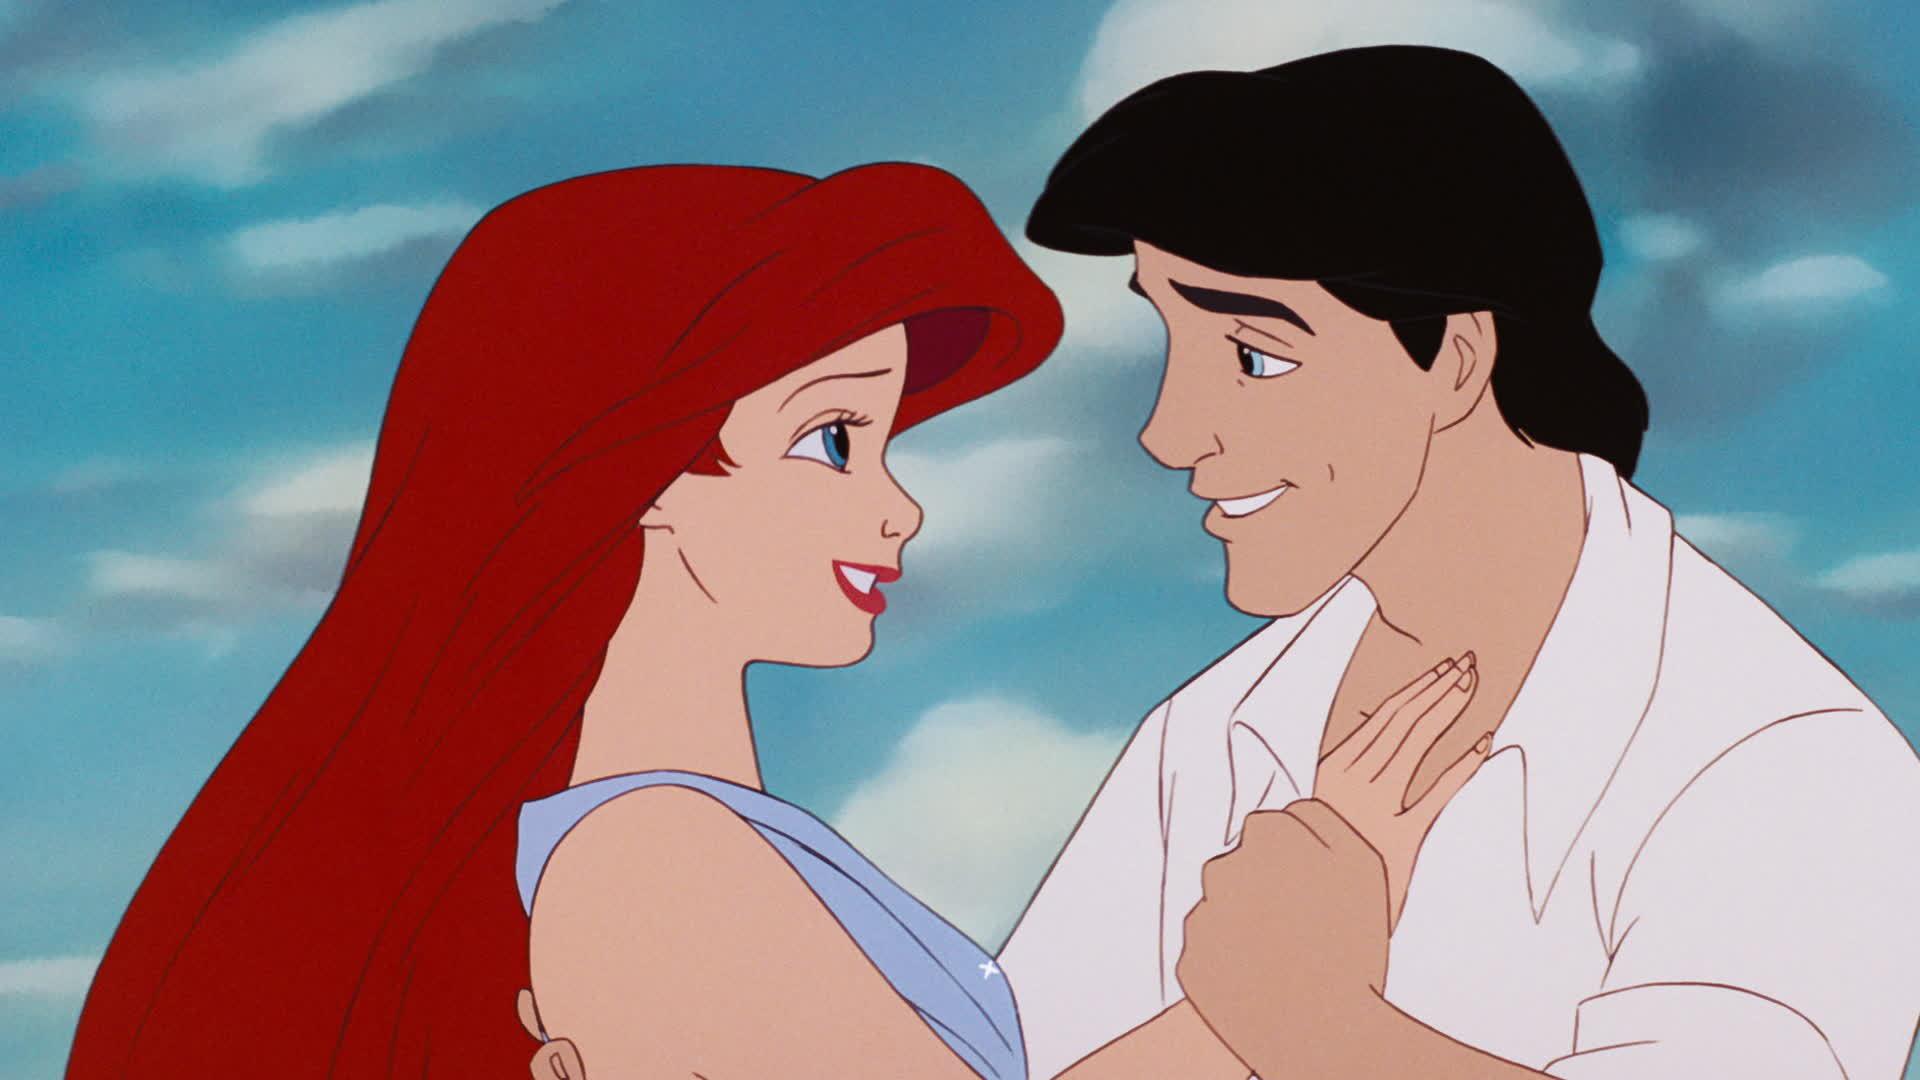 My Favorite Princess Story: The Little Mermaid